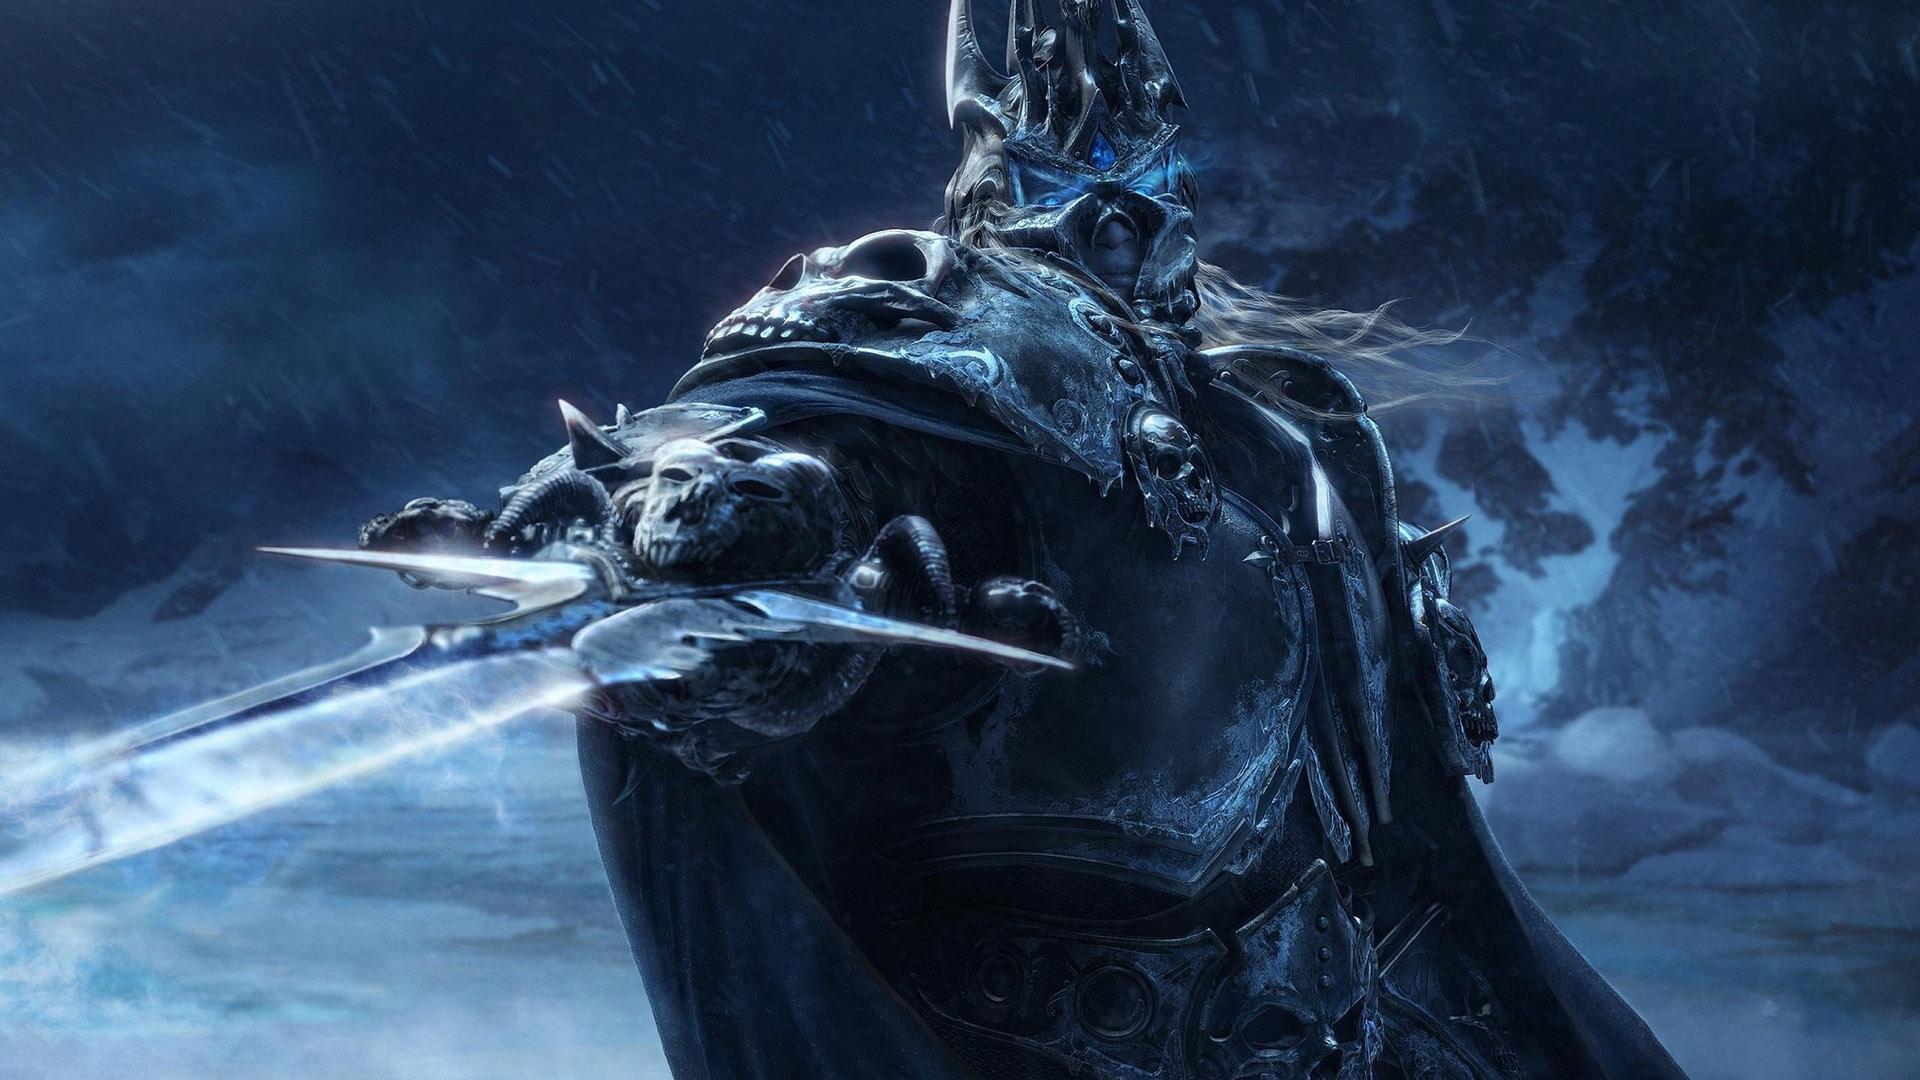 Warcraft 3 wallpaper 7